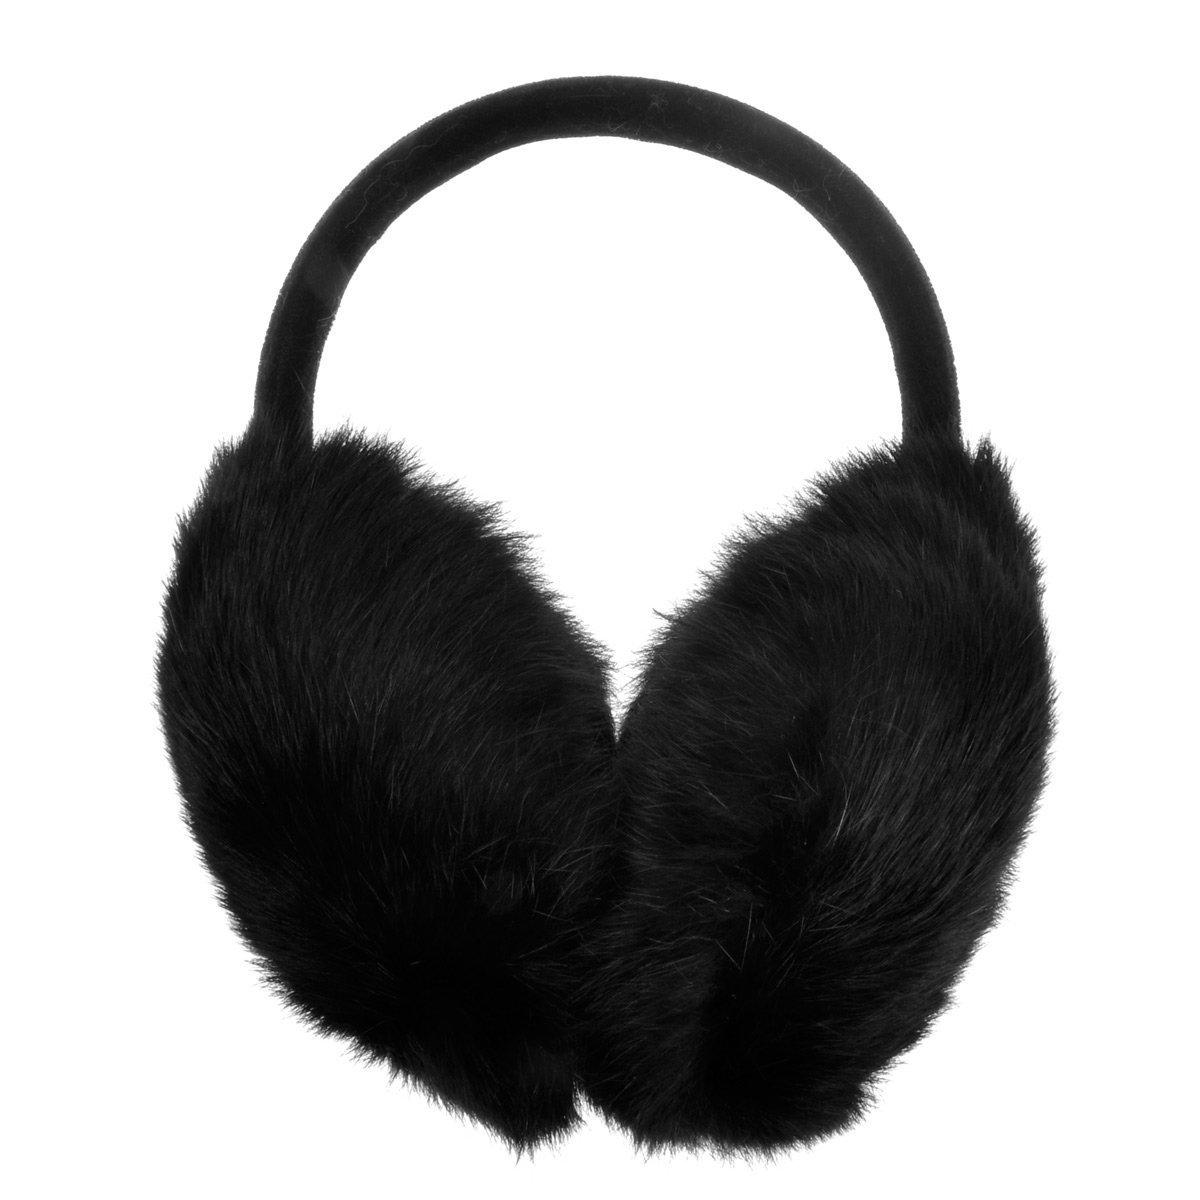 ZLYC Womens Girls Genuine Rabbit Fur EarMuffs Adjustable Ear Warmers